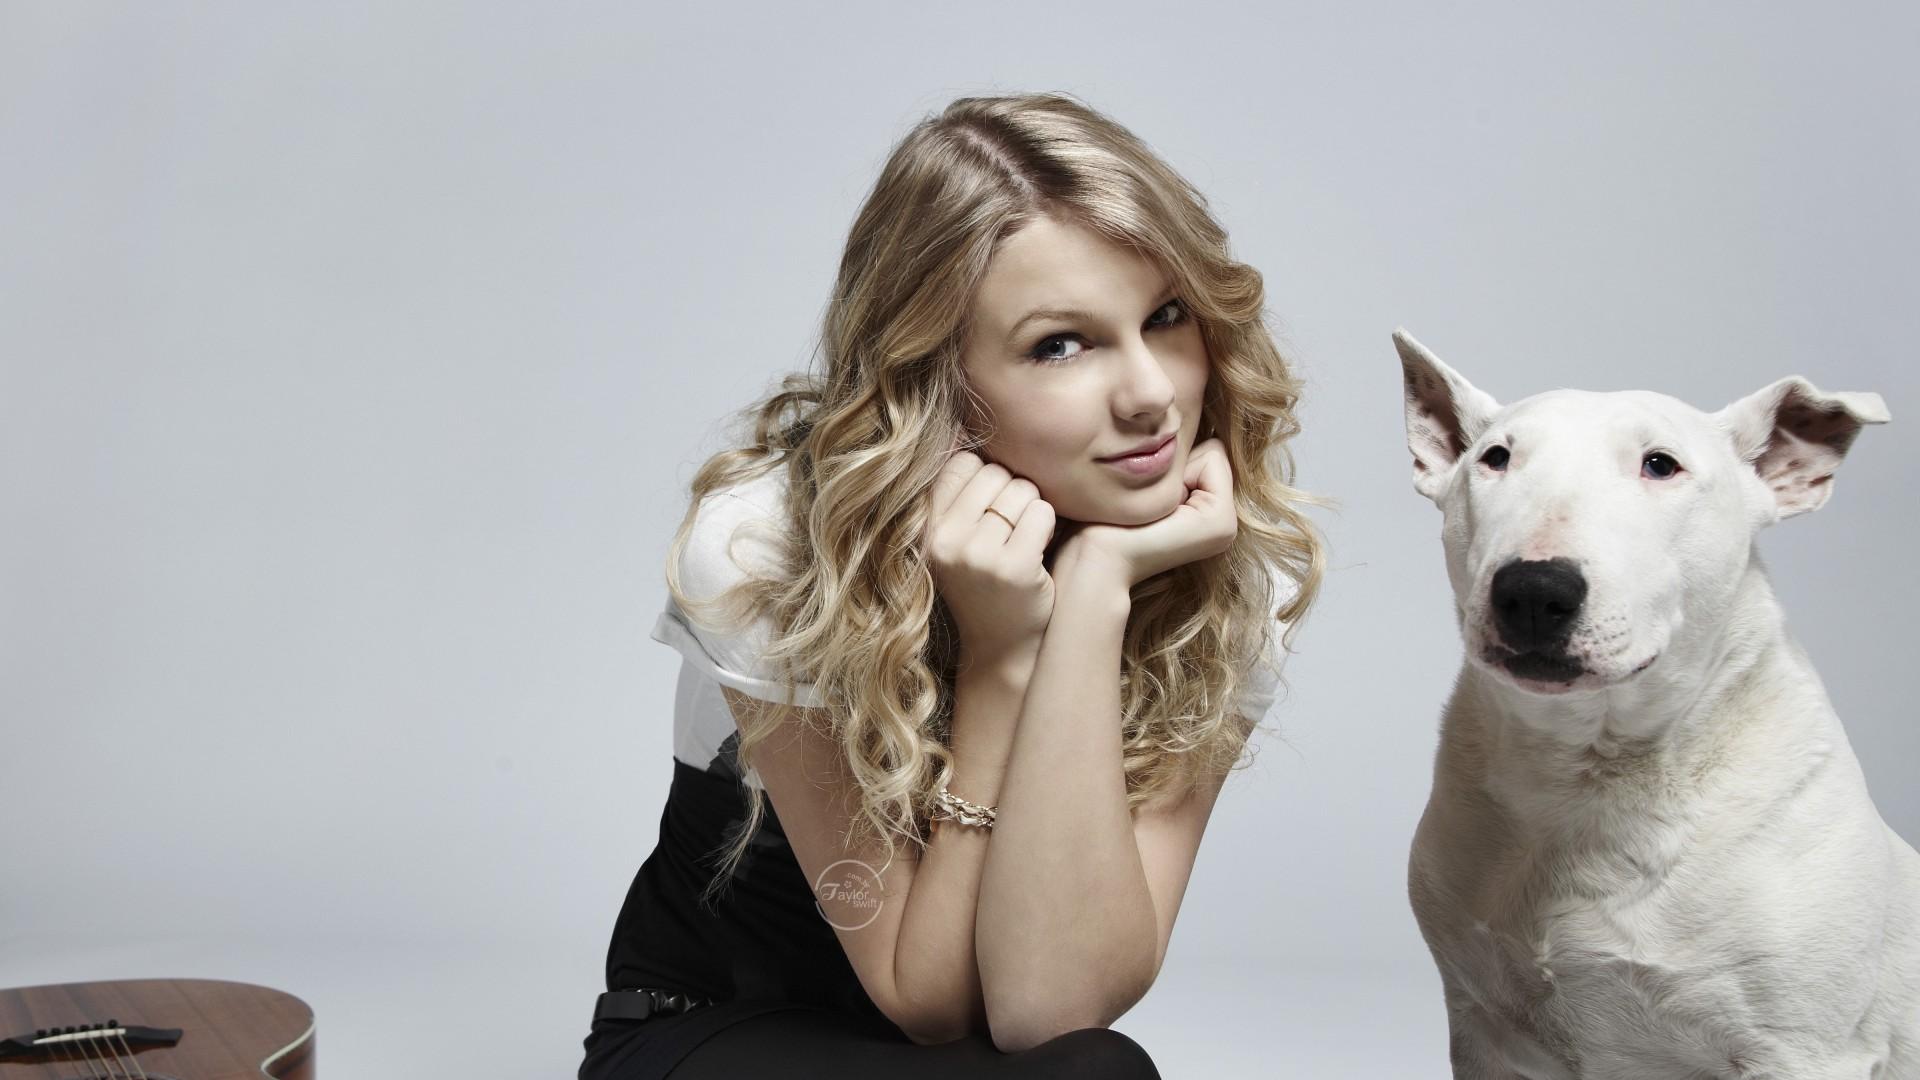 Taylor Swift With Puppy - Taylor Swift With Puppy